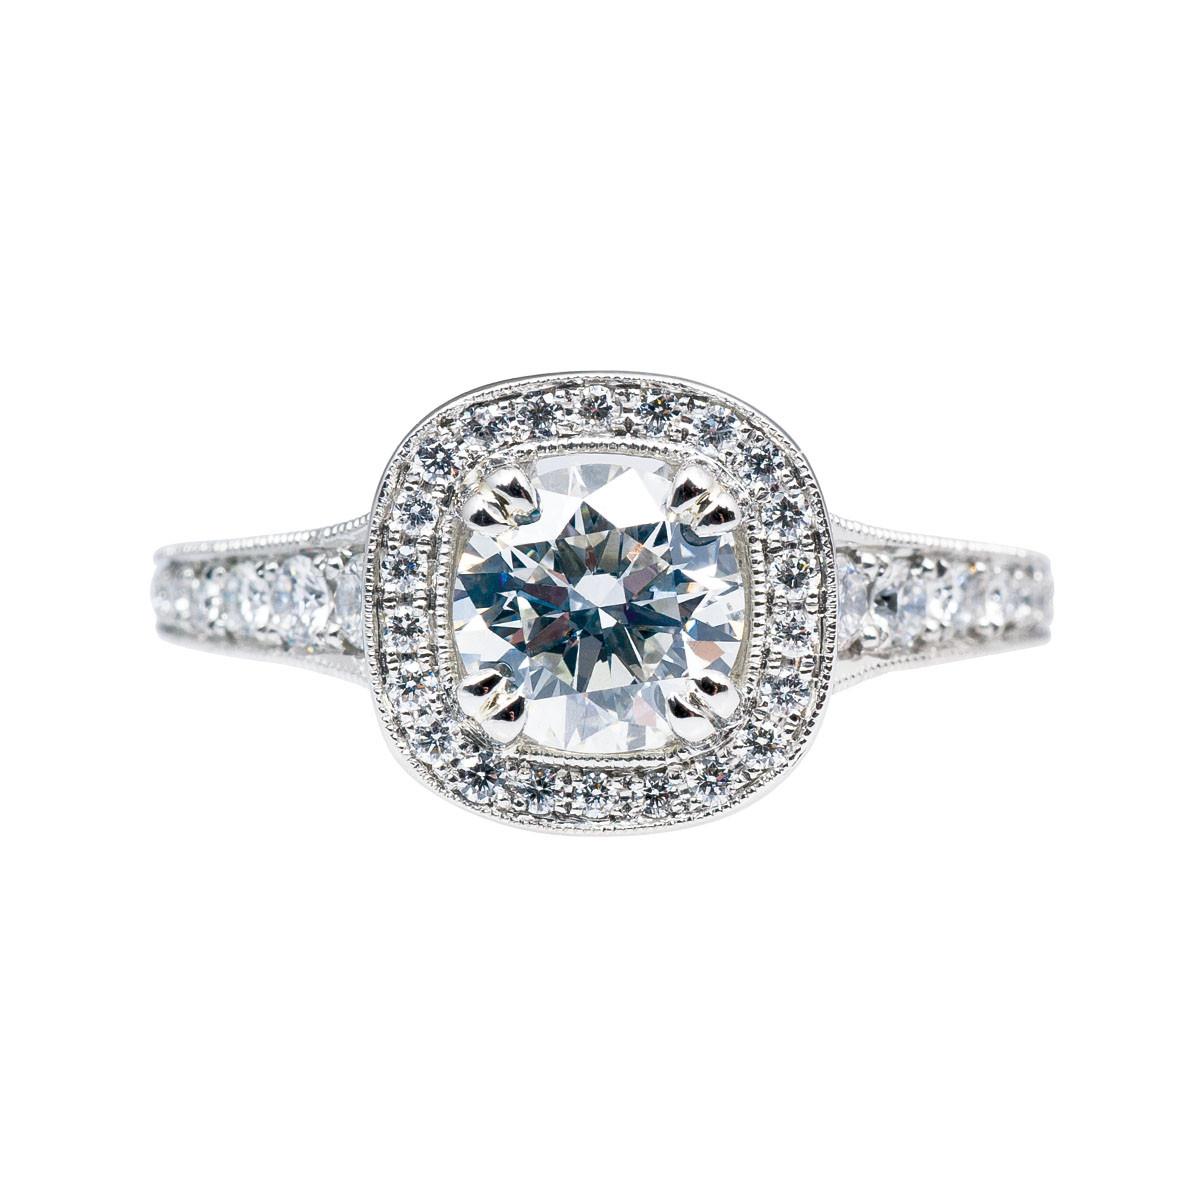 Vintage Jeff Cooper 1.69 CTW Diamond Halo Engagement Ring